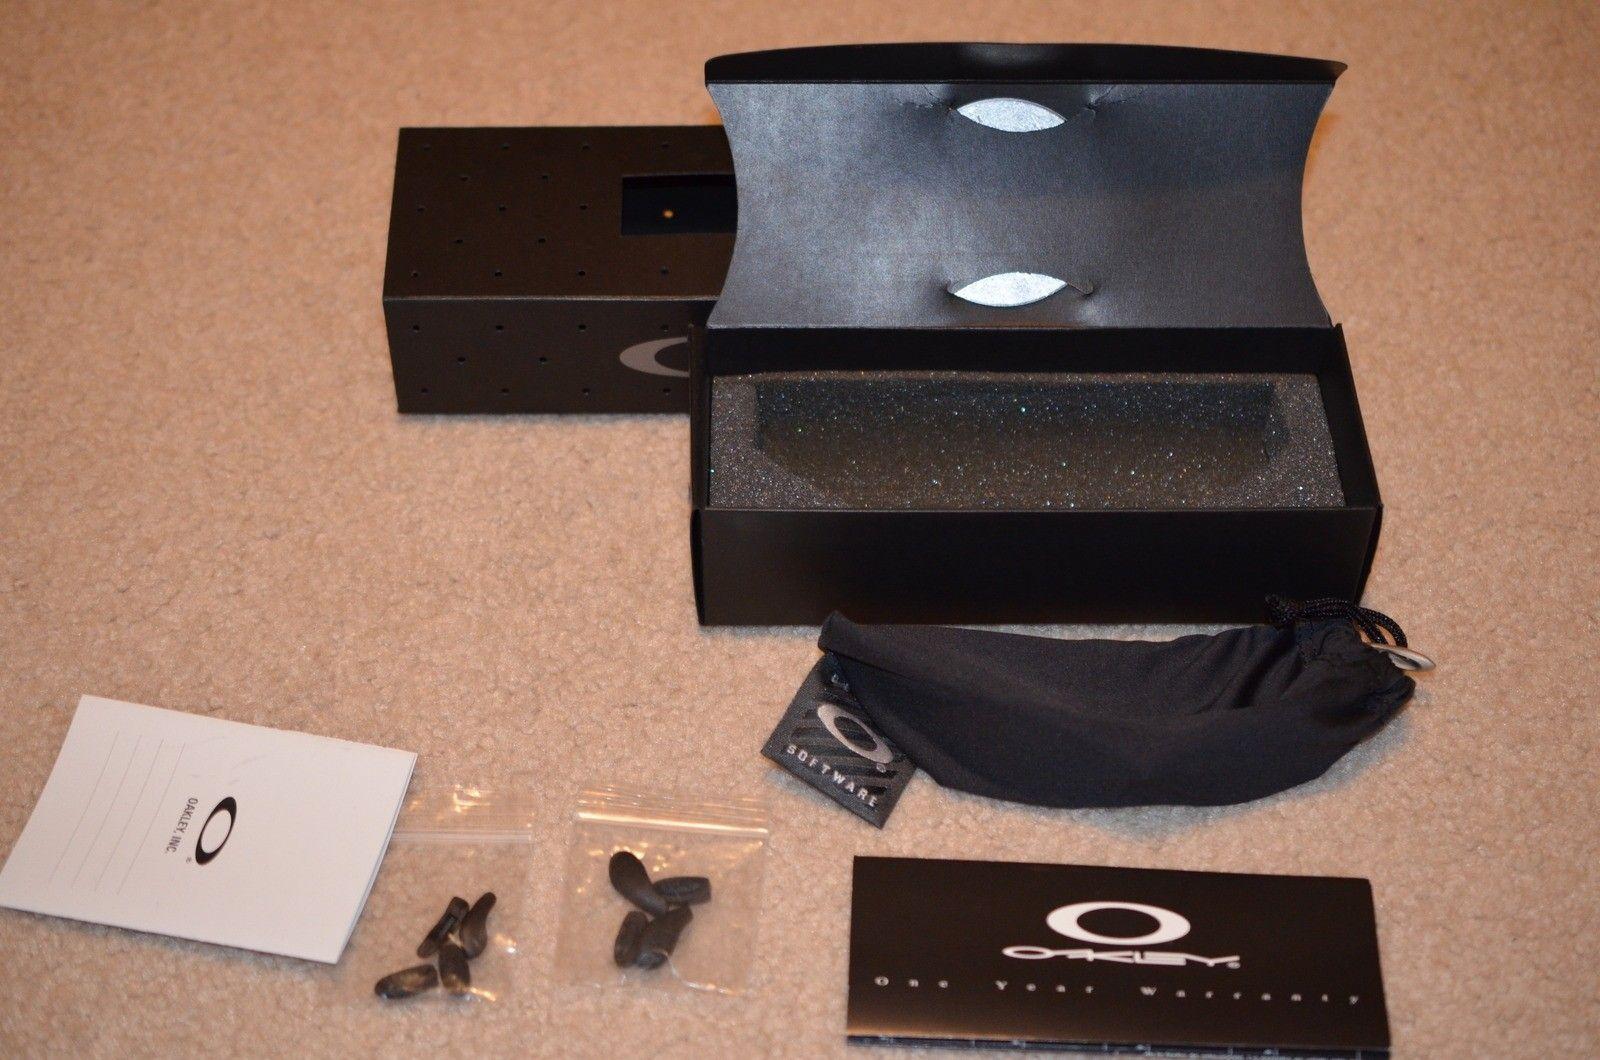 BNIB 1st Gen Plasma Fire Juliet With Matching Box And All Extras - 02.jpg